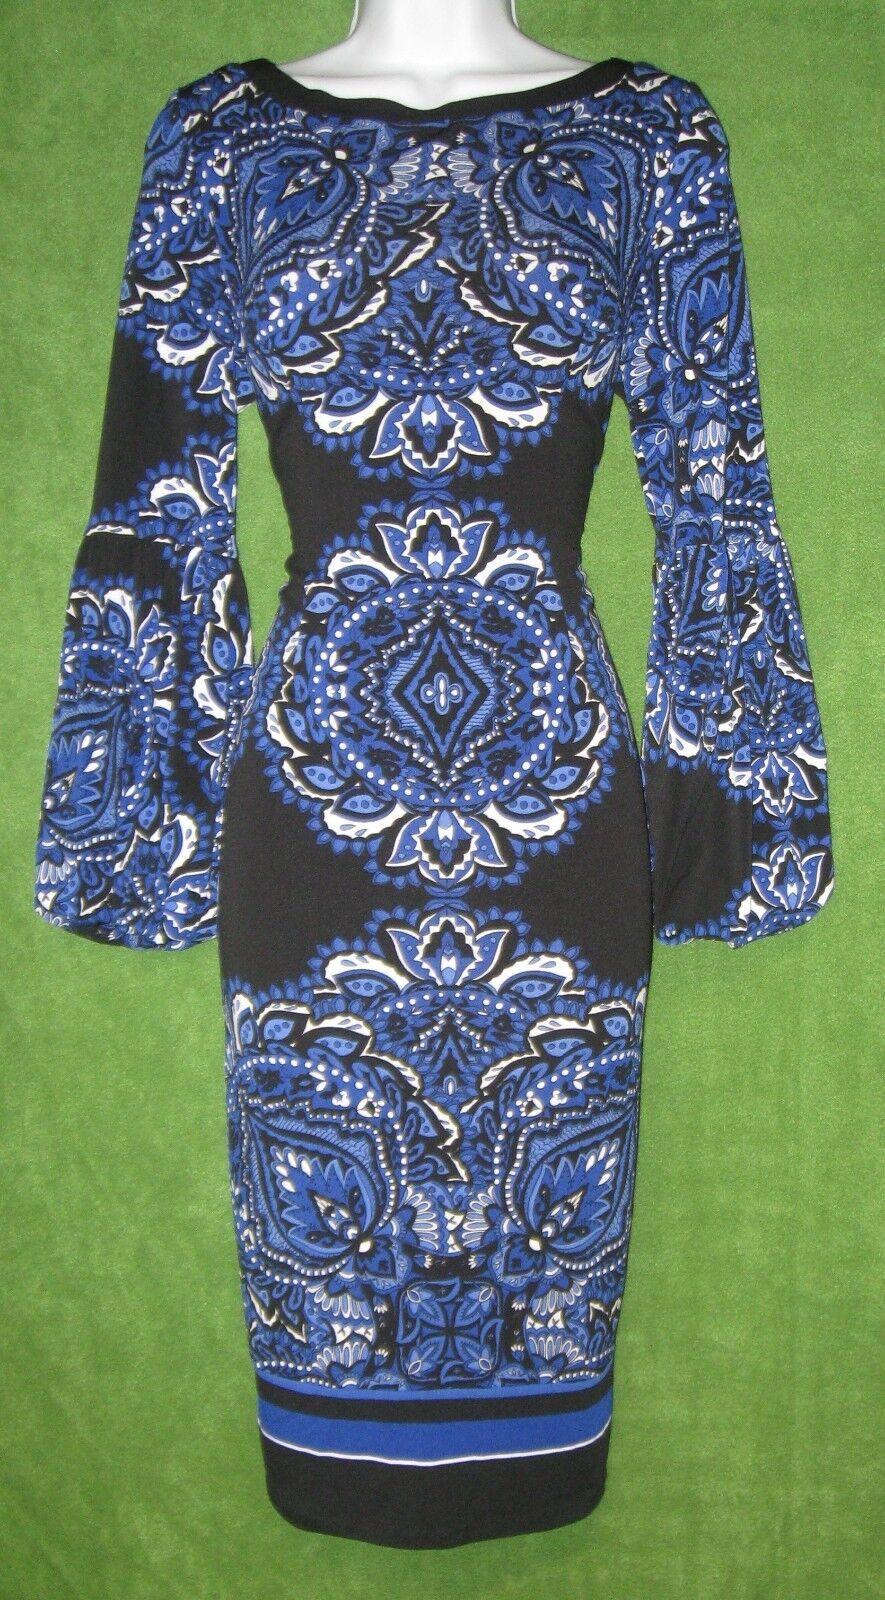 INC International Concepts schwarz Blau Print Sheath Bell Social Dress S 4 6